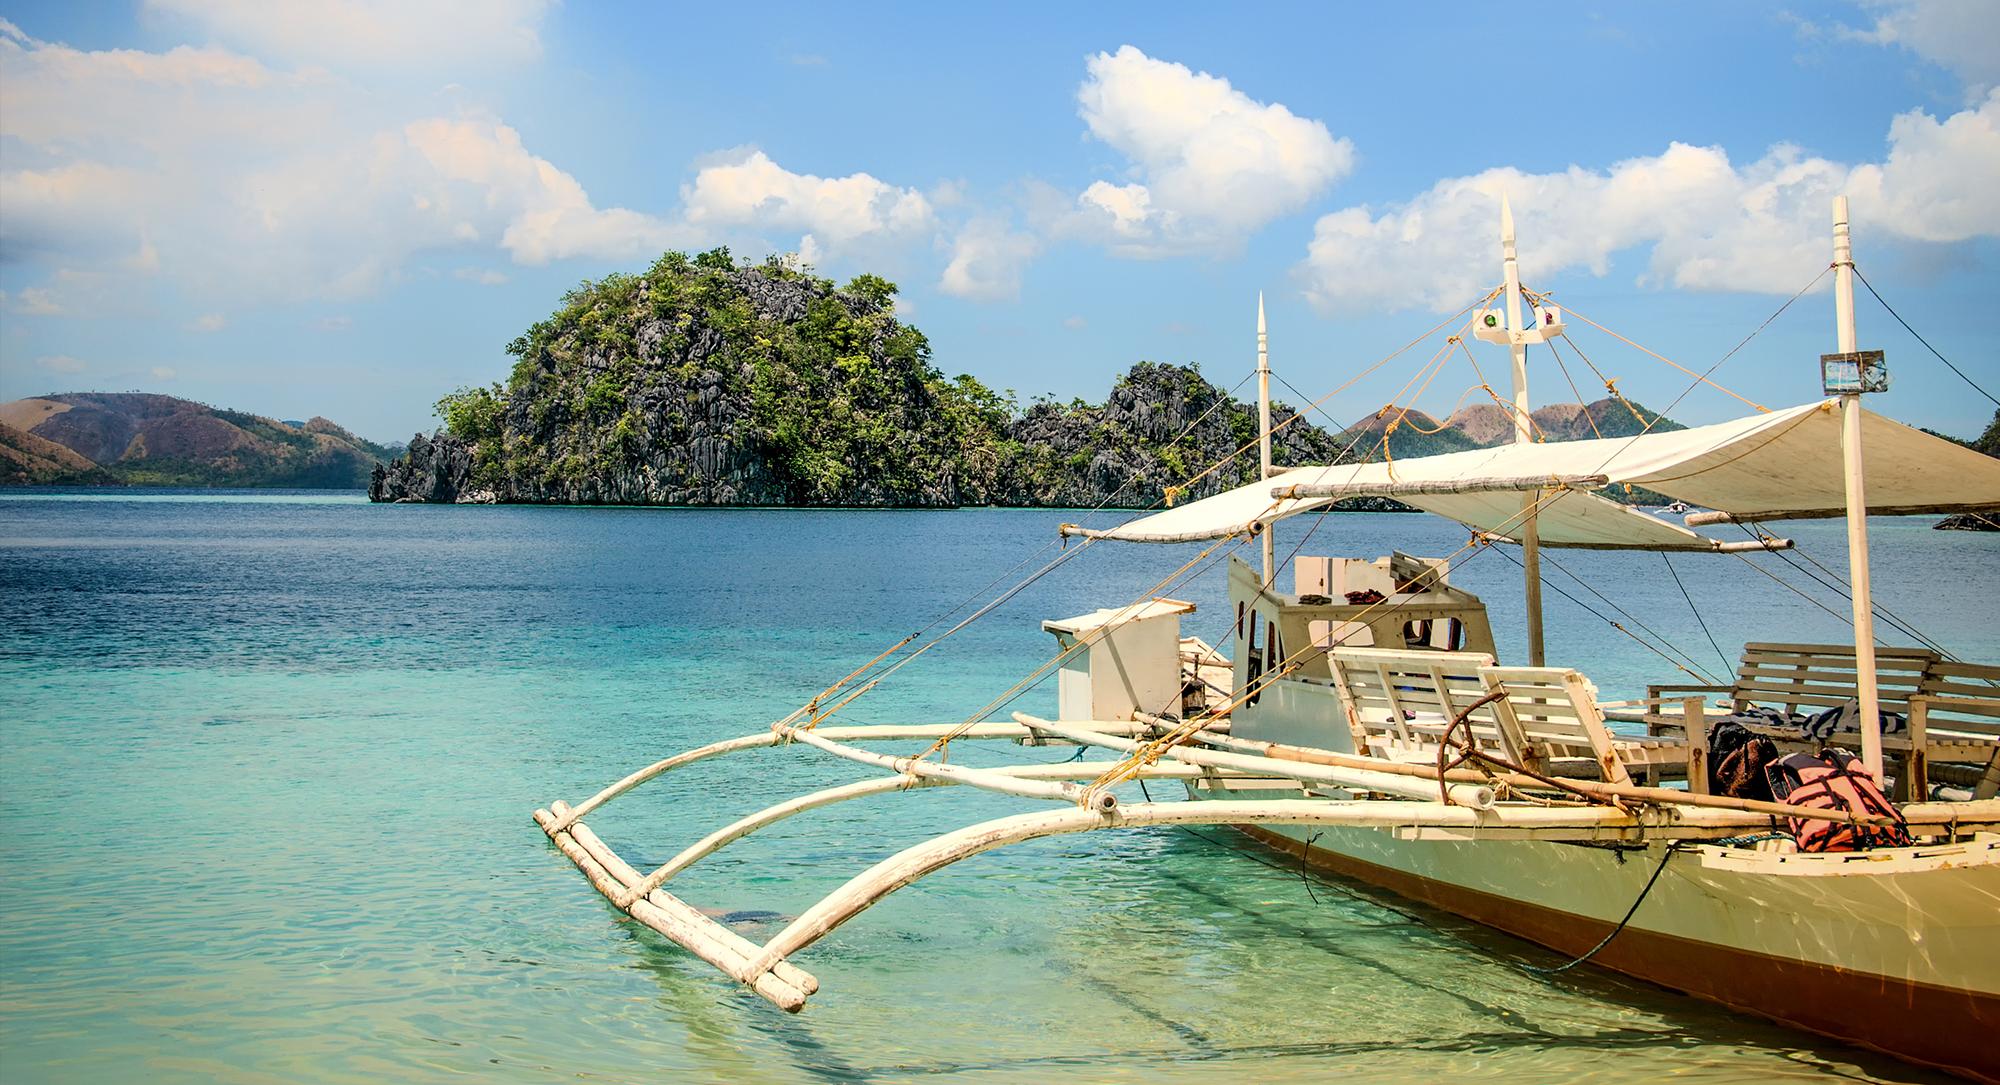 Onwards to paradise?  Yes please.